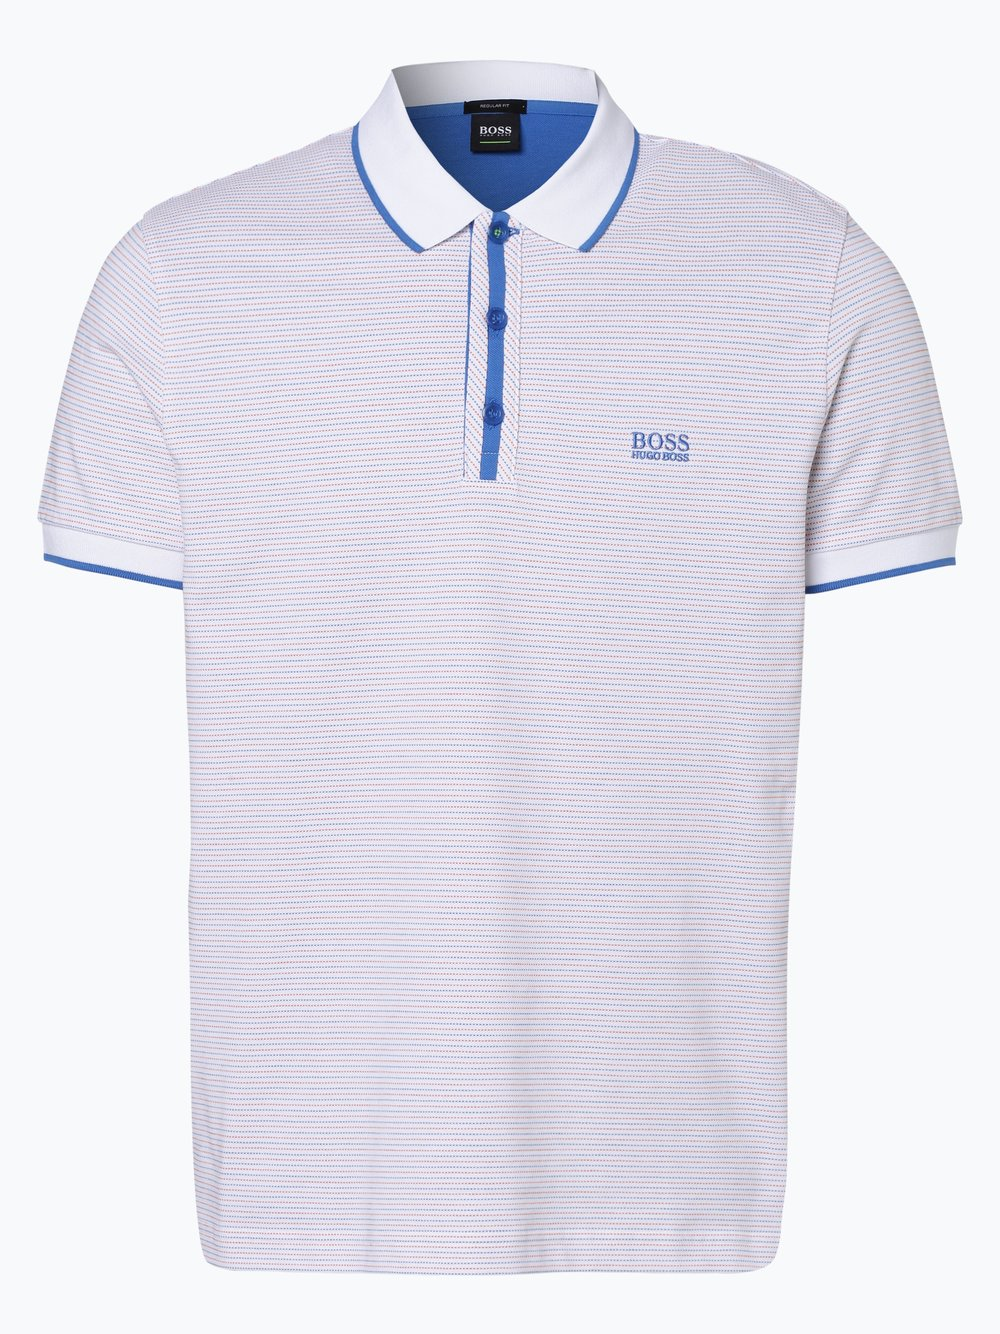 quality design 926ae d1ecb BOSS Athleisure Herren Poloshirt - Paddy 5 online kaufen ...